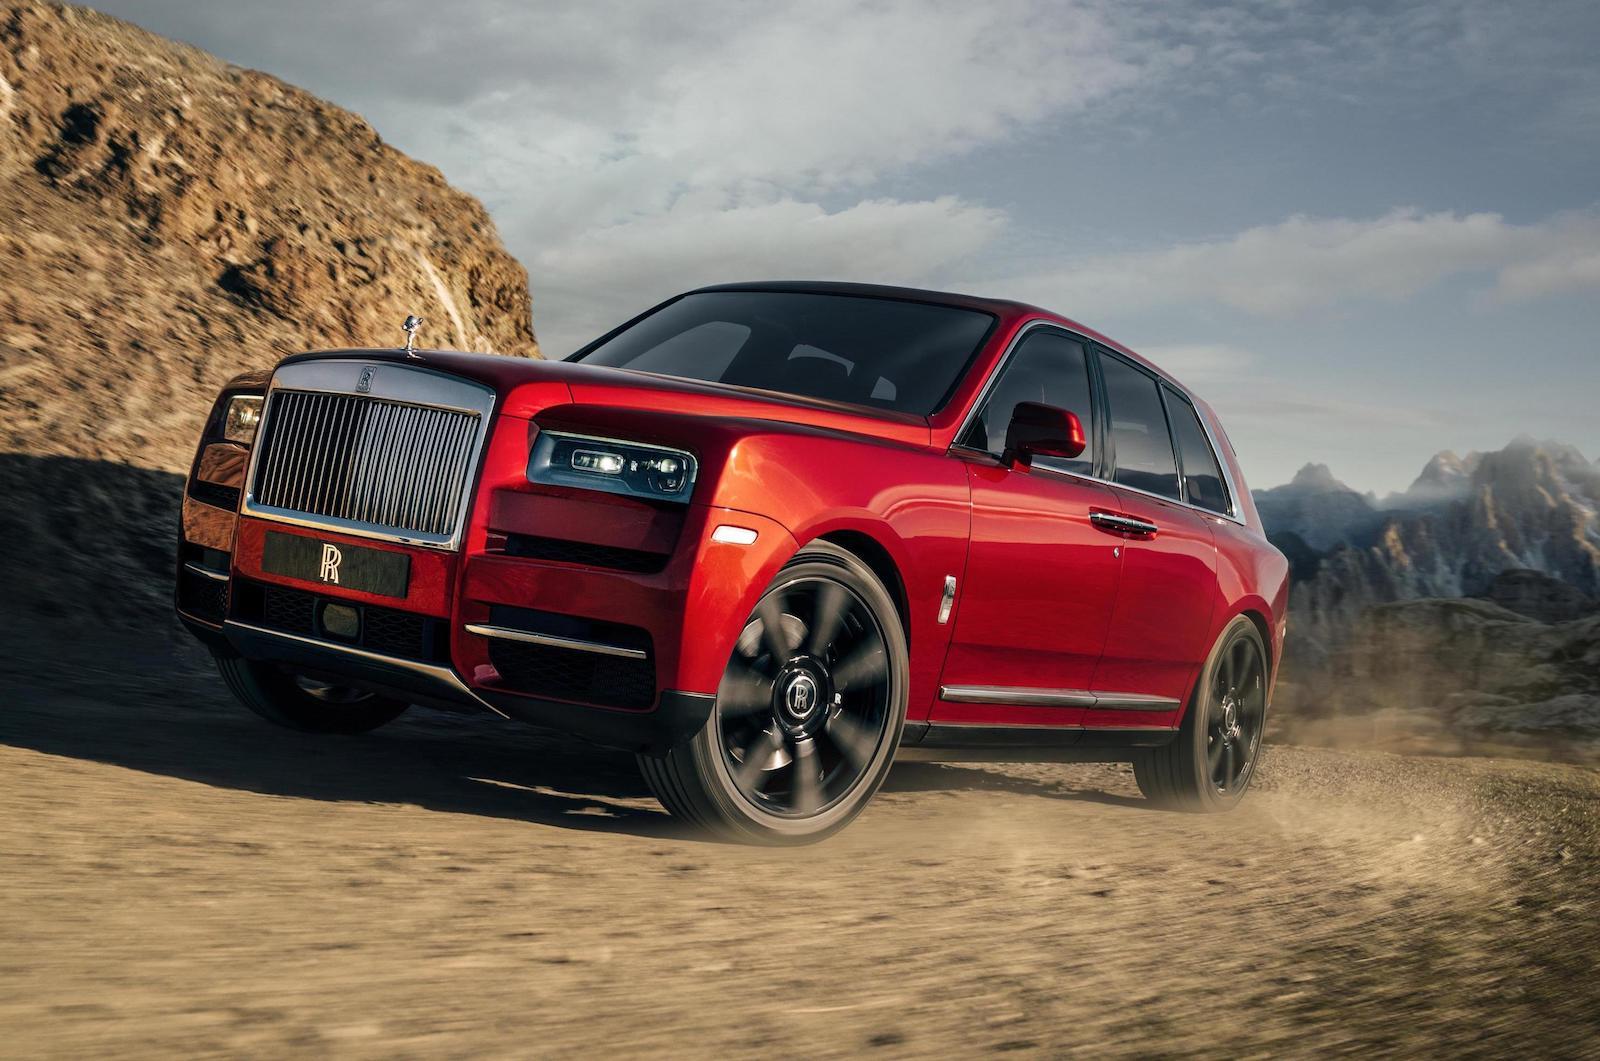 Rolls Royce Cullinan Suv Unveiled Performancedrive